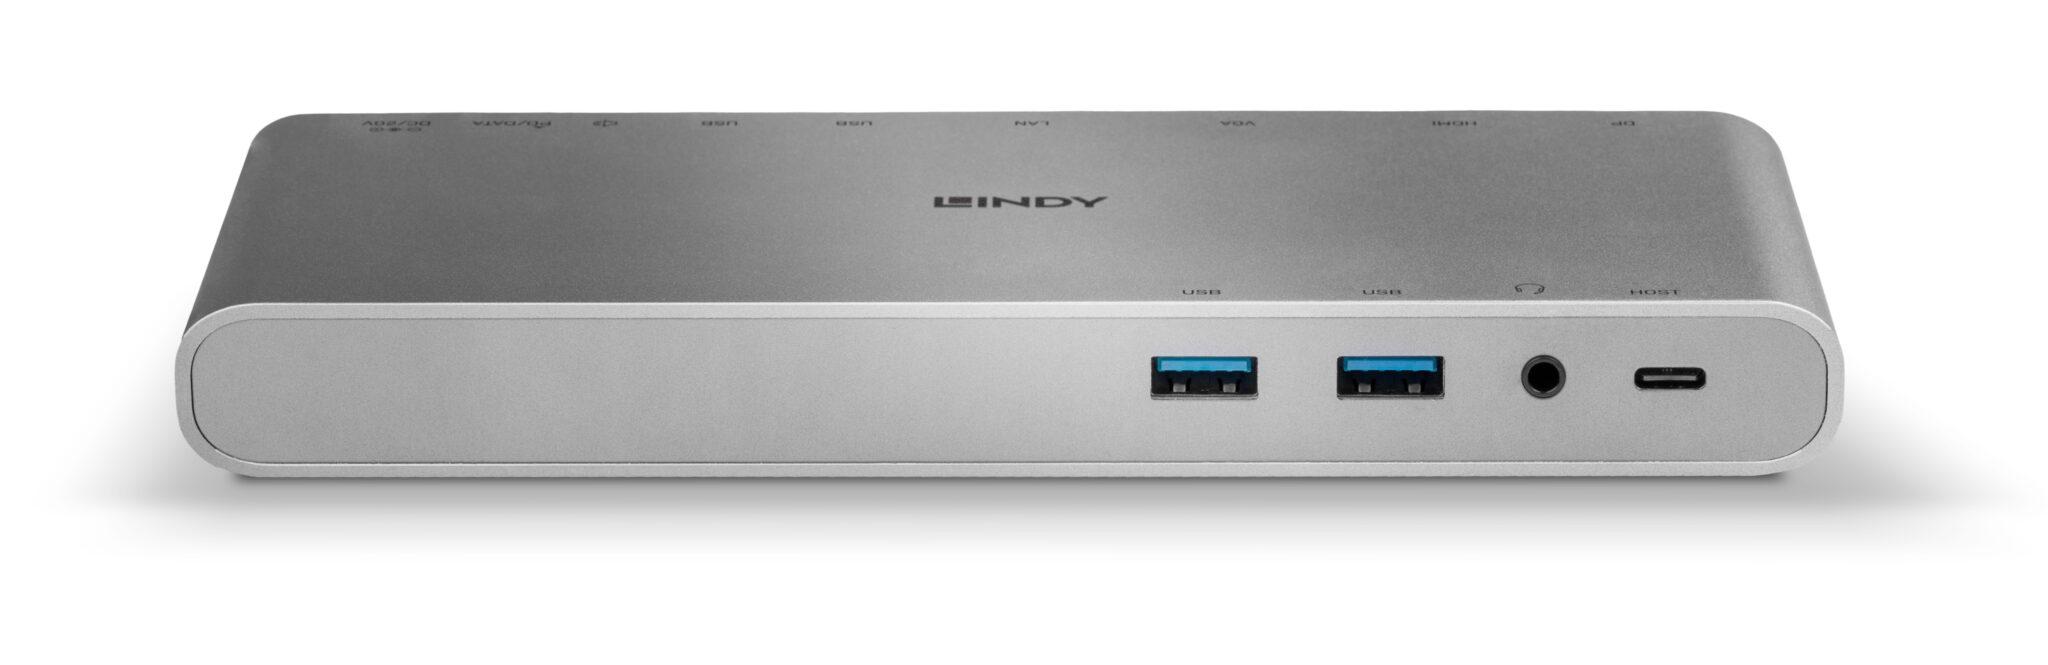 USB 3.1 Typ C Notebook Docking Station 43226 Frontansicht